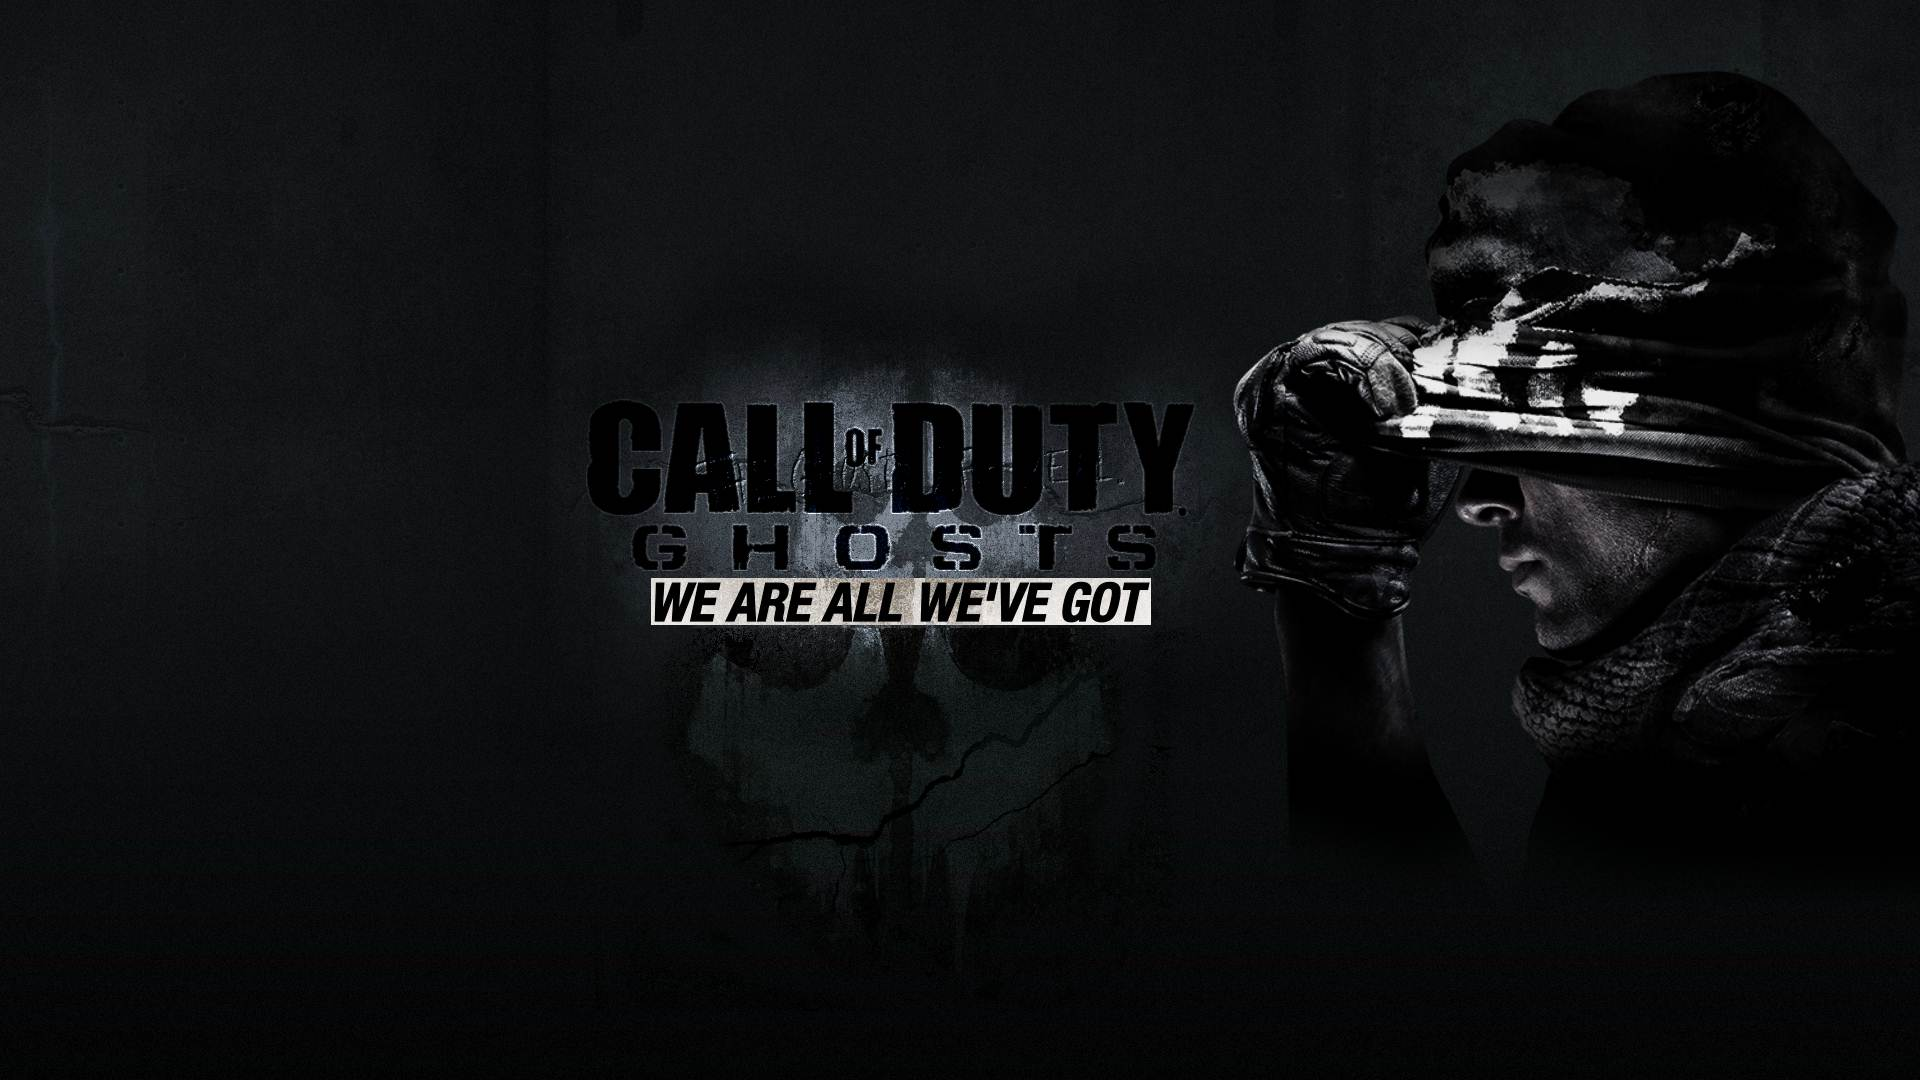 Call Of Duty Ghost Wallpaper – Dota 2 and E-Sports Geeks Dota 2